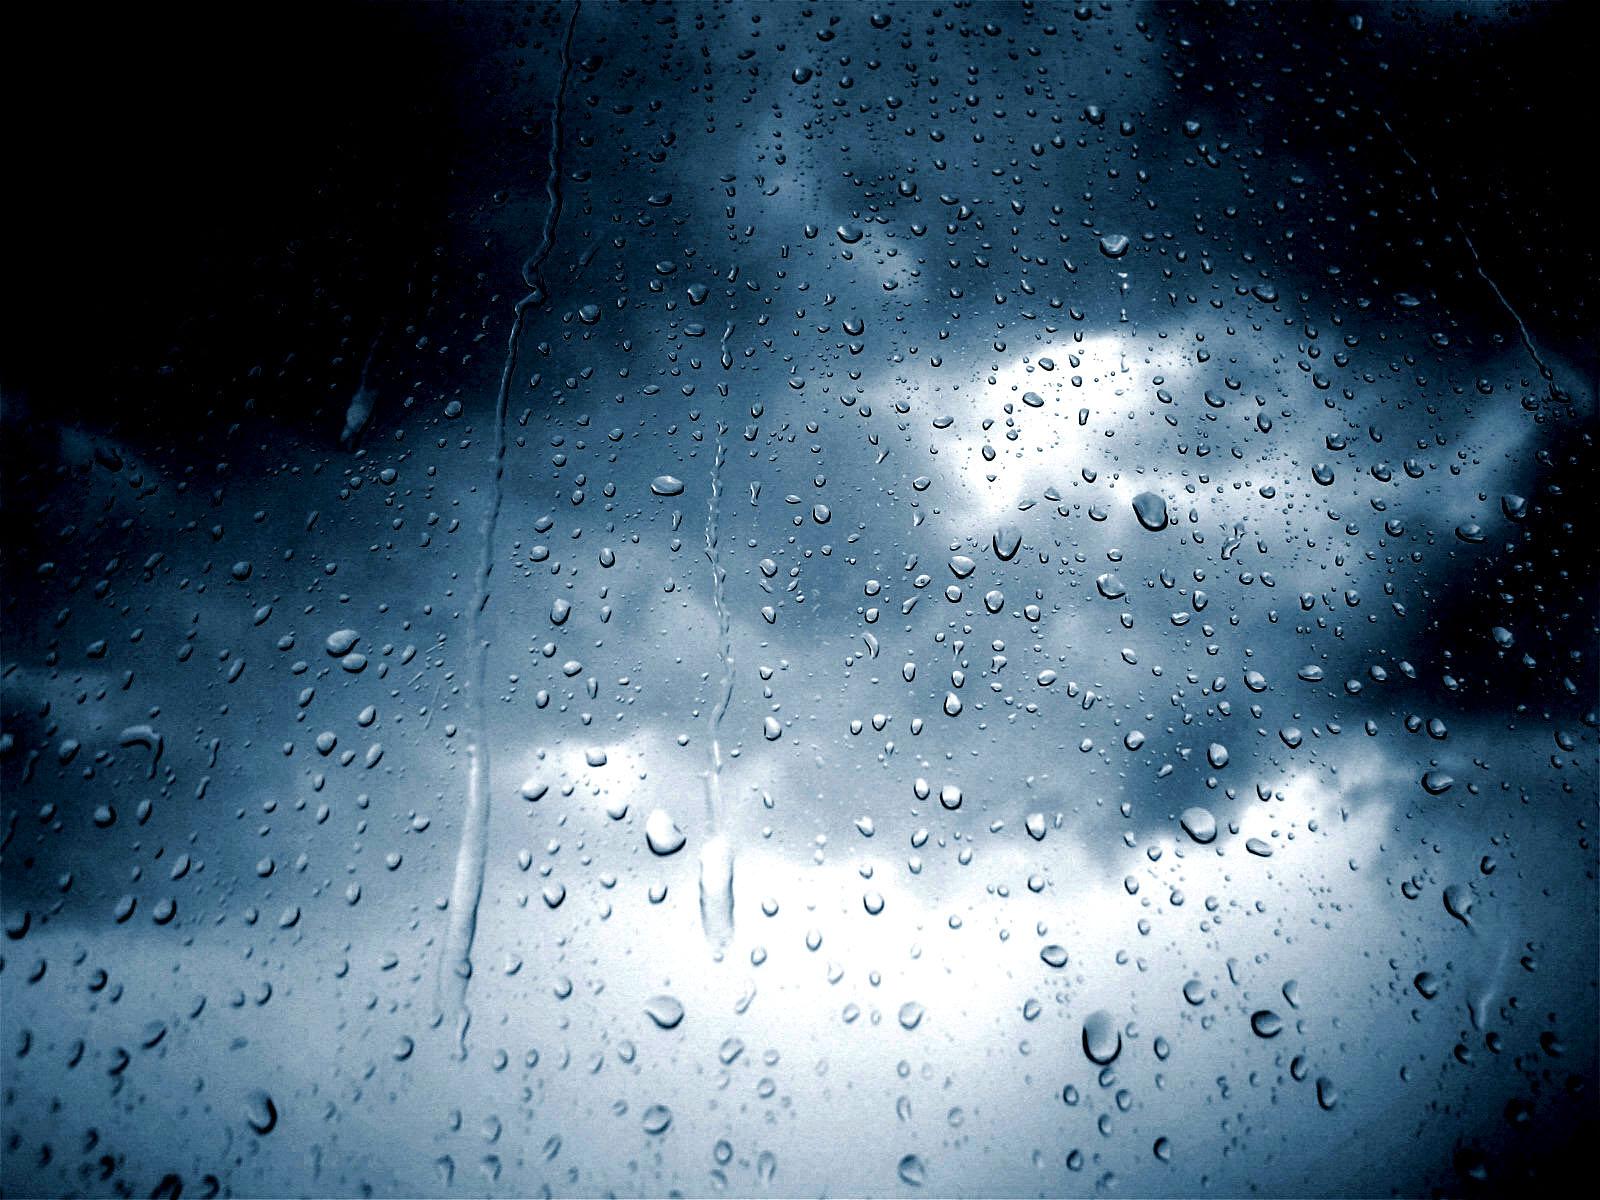 rain wallpaper rain wallpaper rain wallpaper rain wallpaper ...